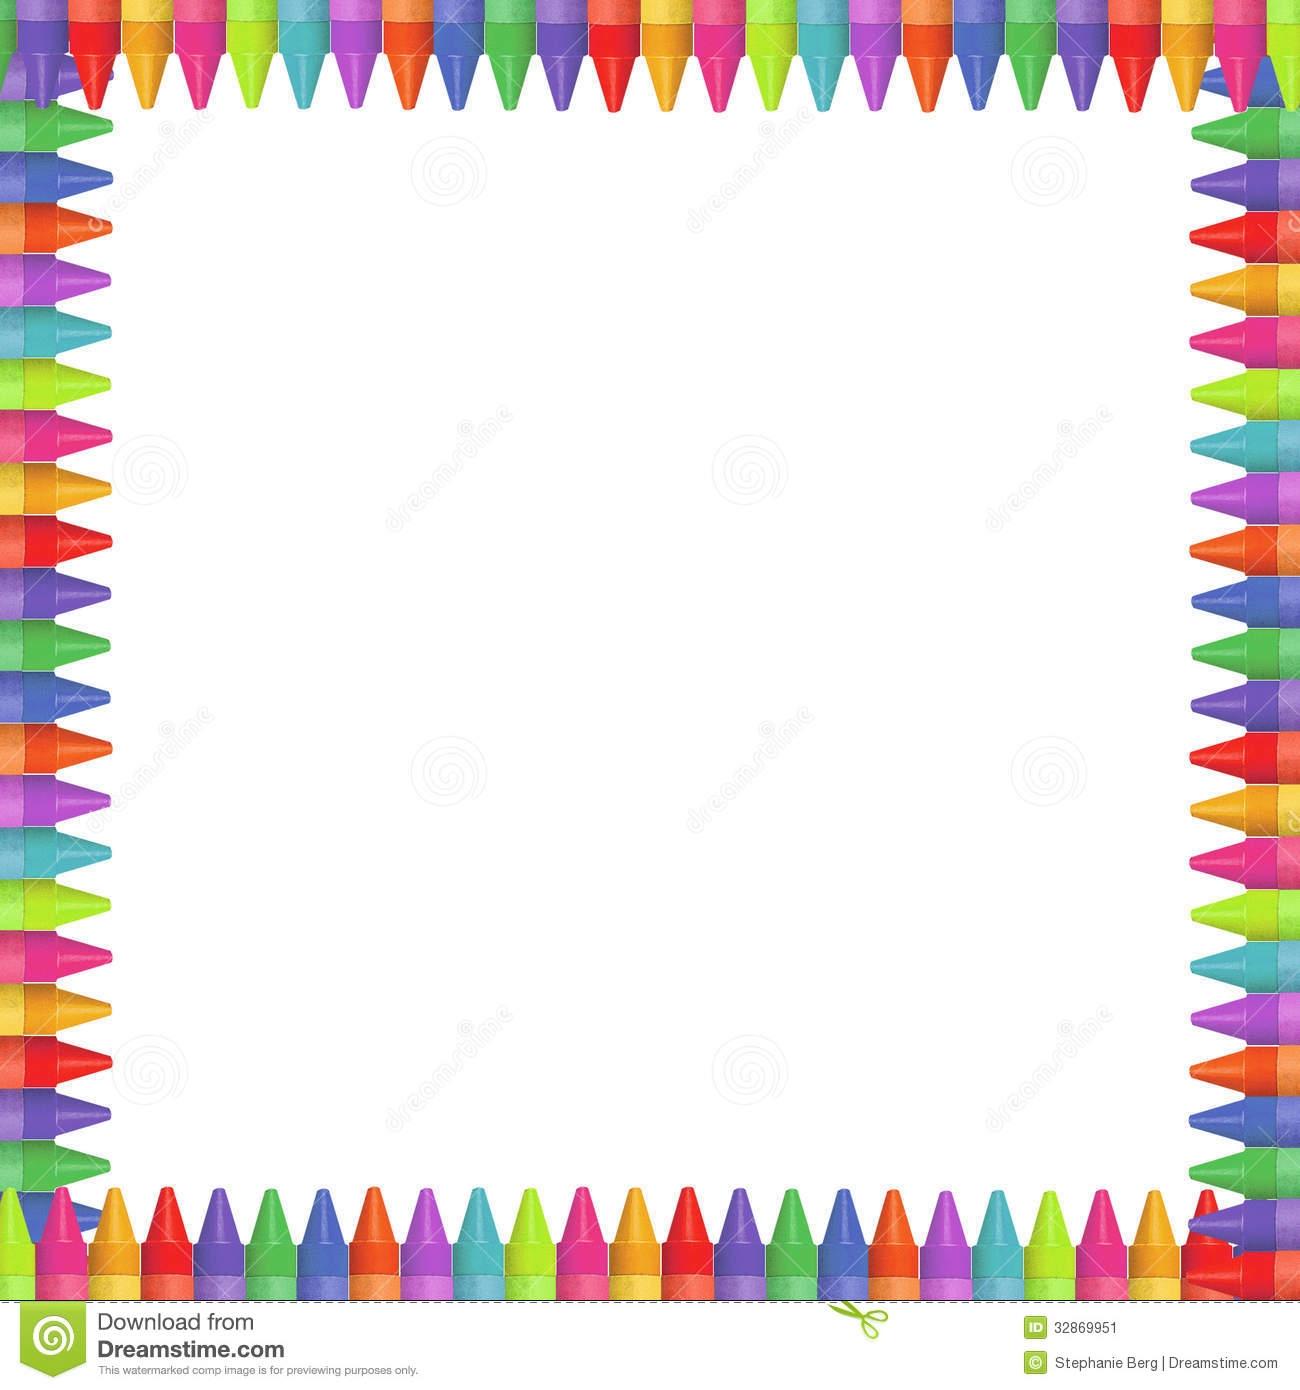 Crayon clipart page border Clipart Crayon Clipart Kid Borders